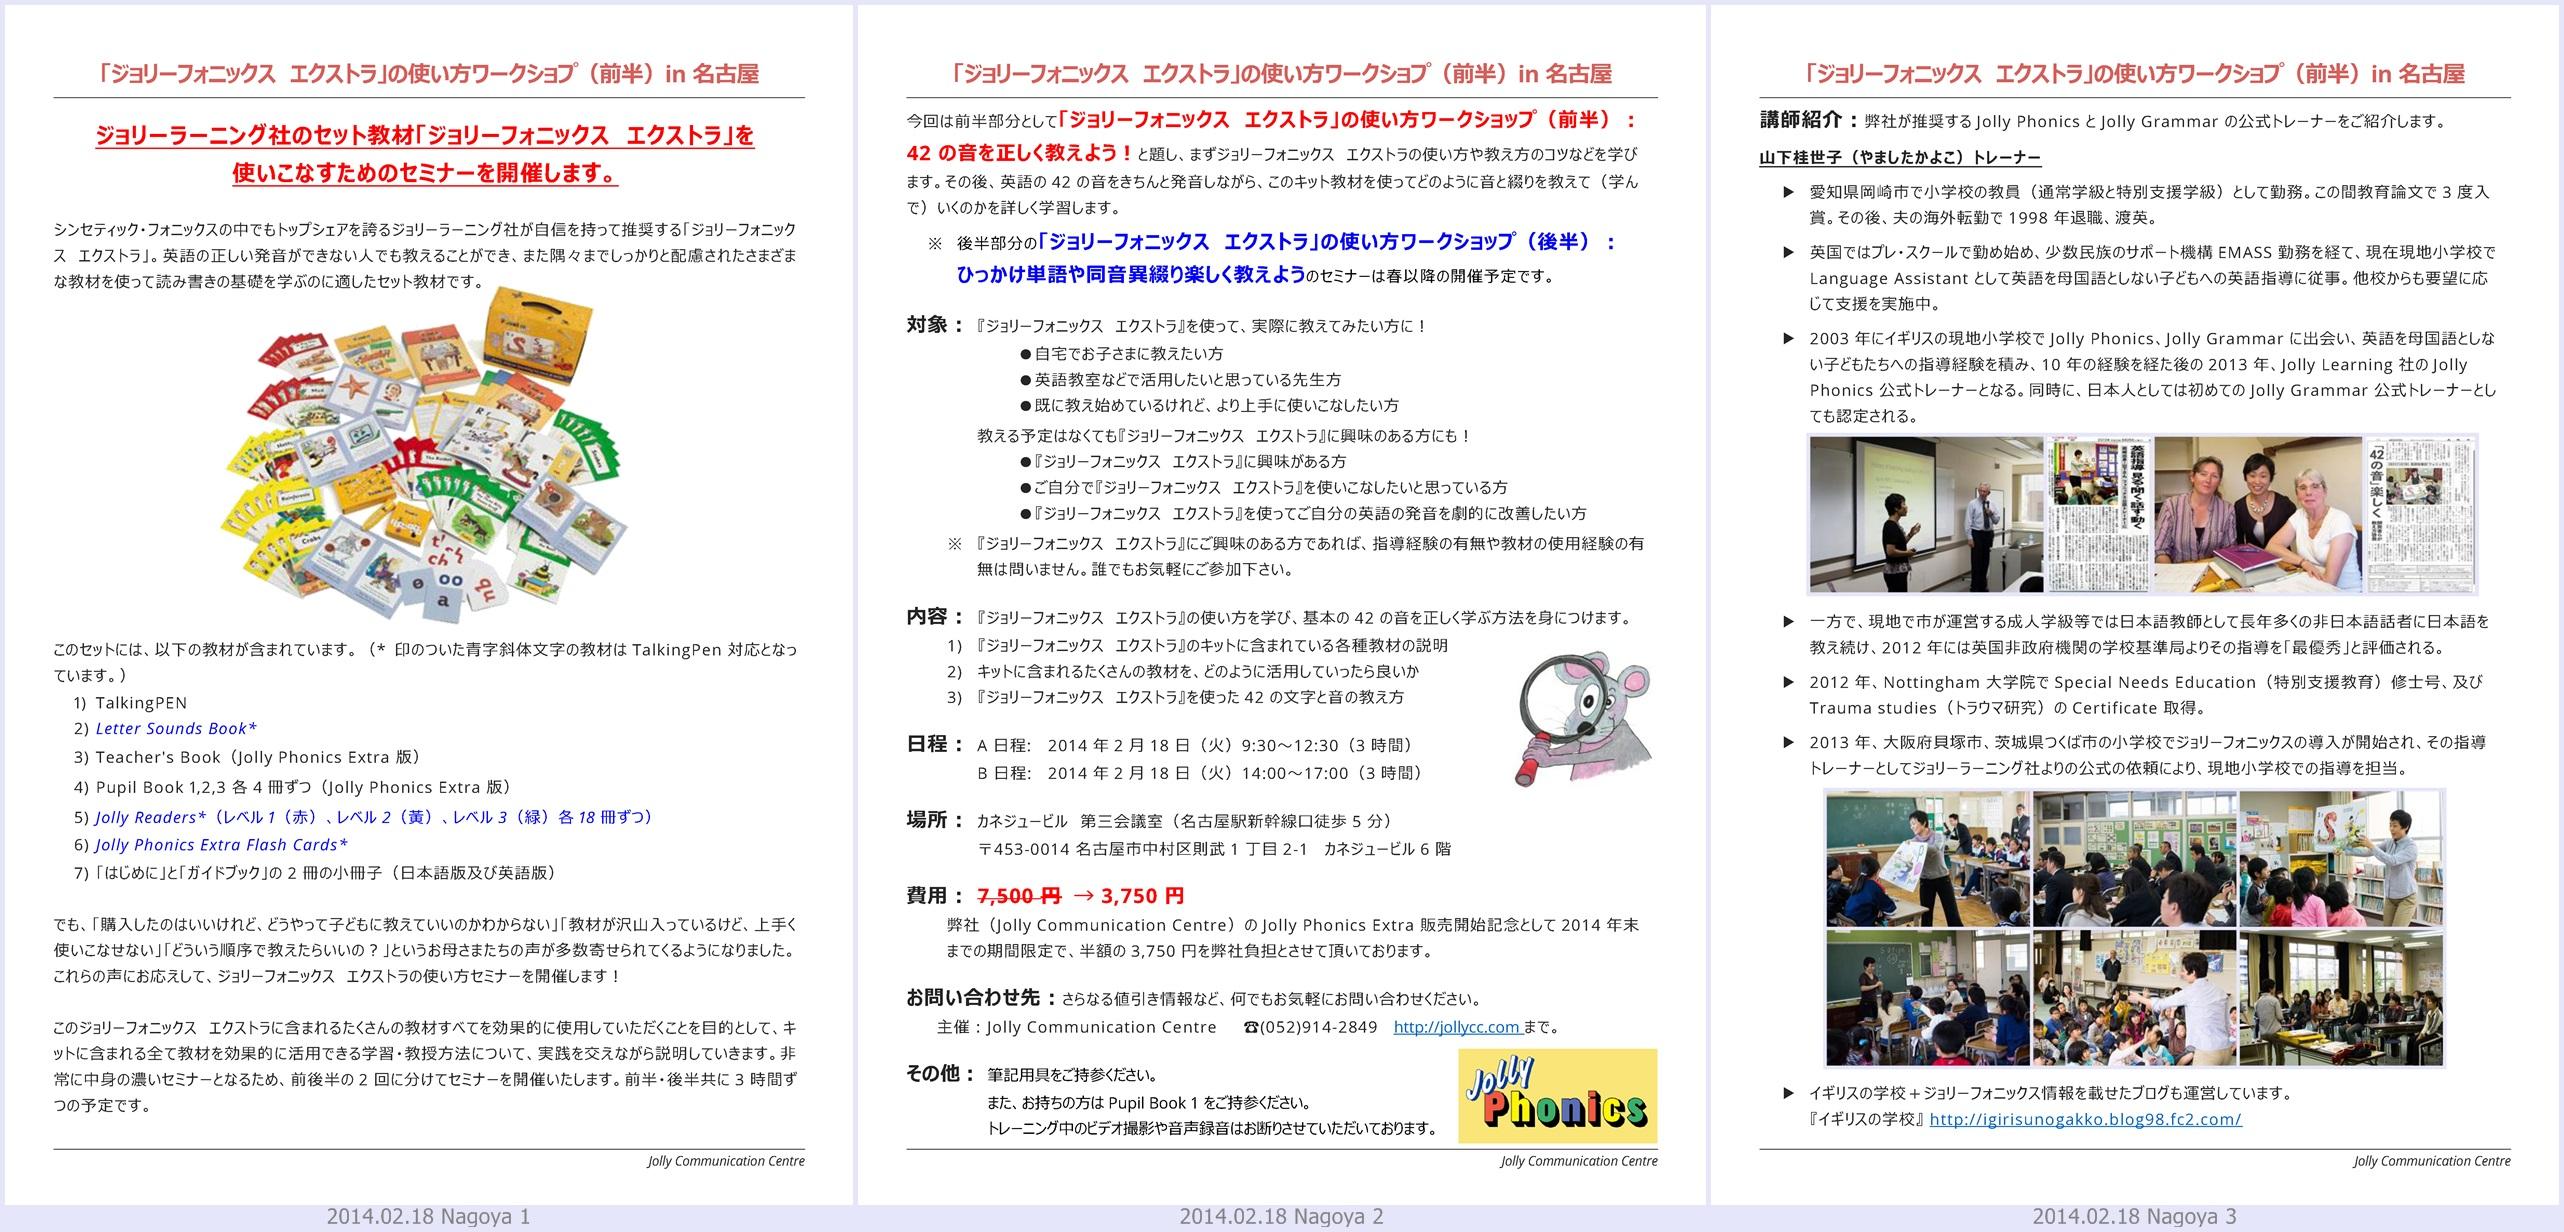 Nagoya_201402010313282a9.jpg